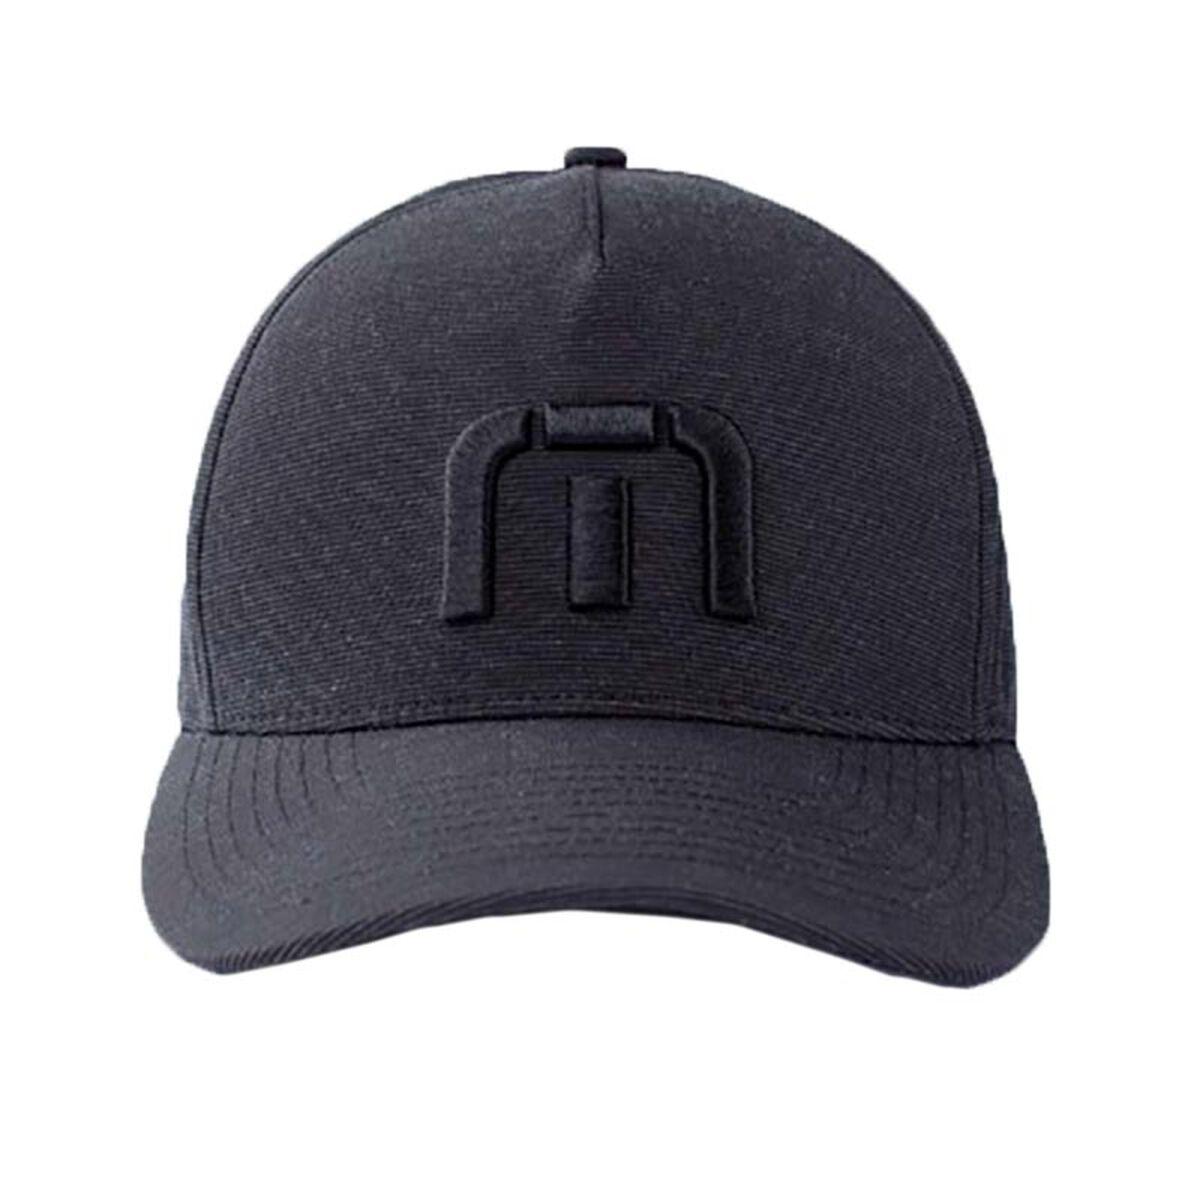 size 40 a6608 25455 TravisMathew Top Shelf Hat Zoom Image